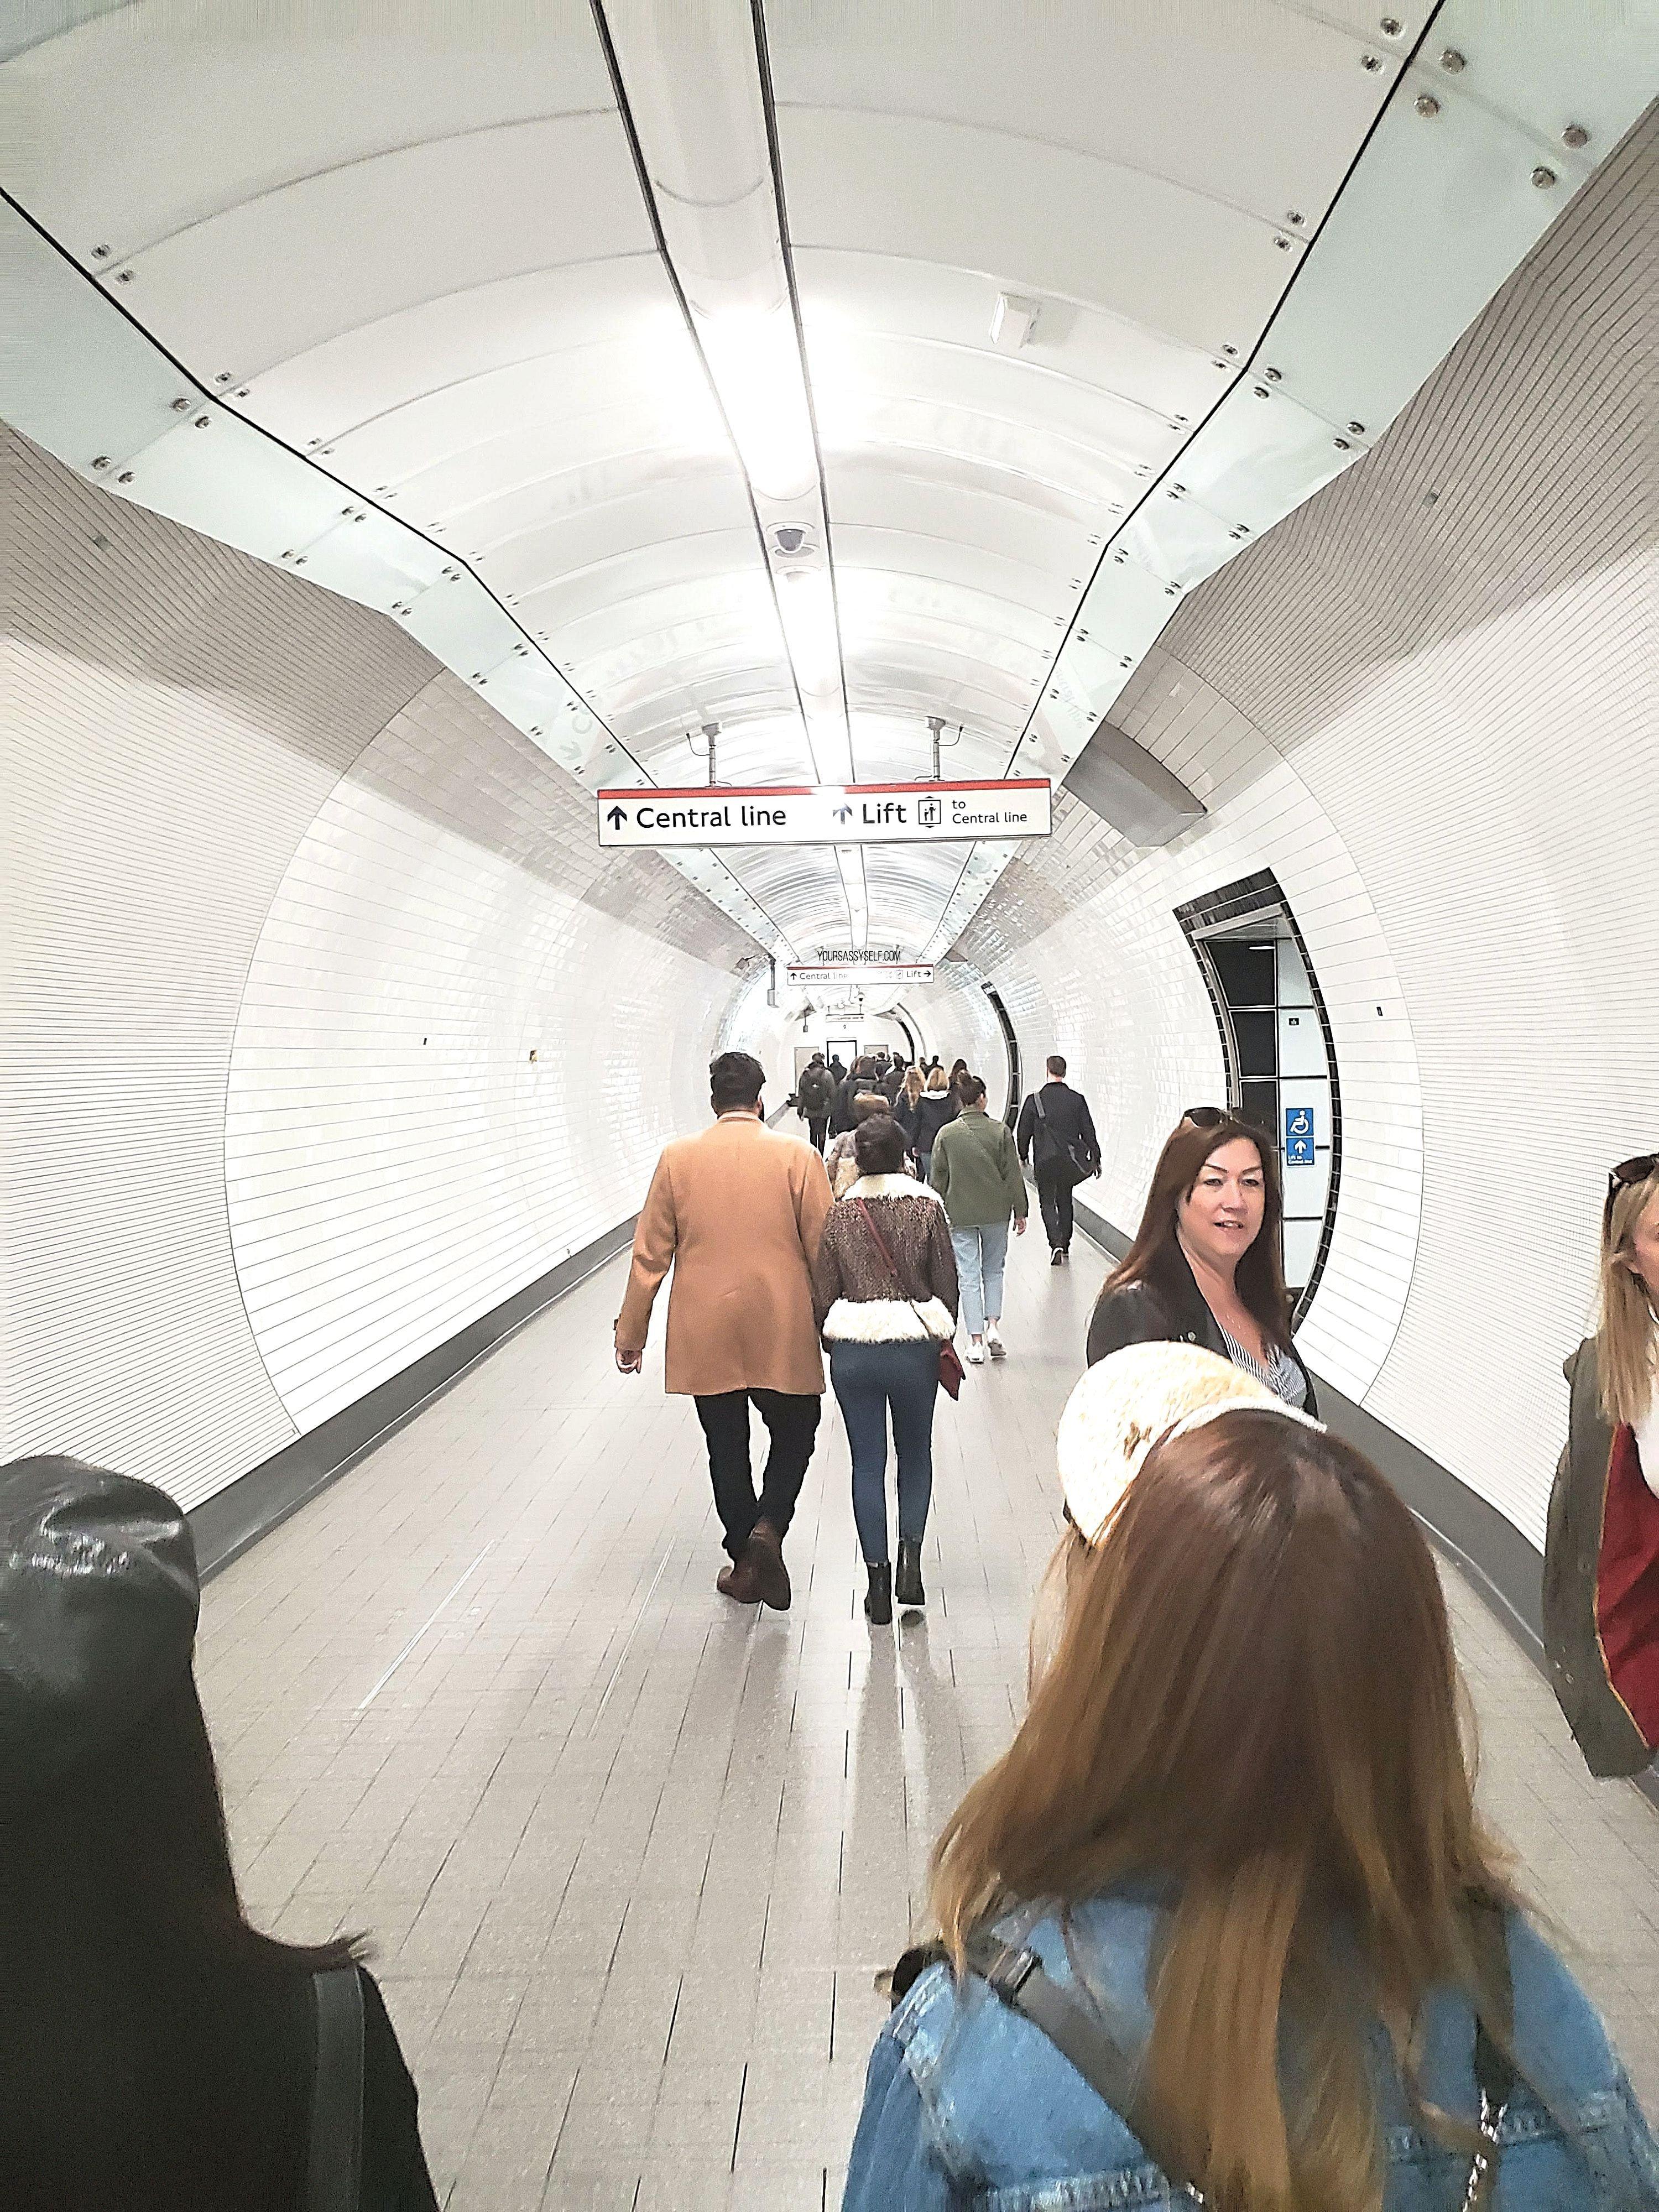 London Tube - yoursassyself.com